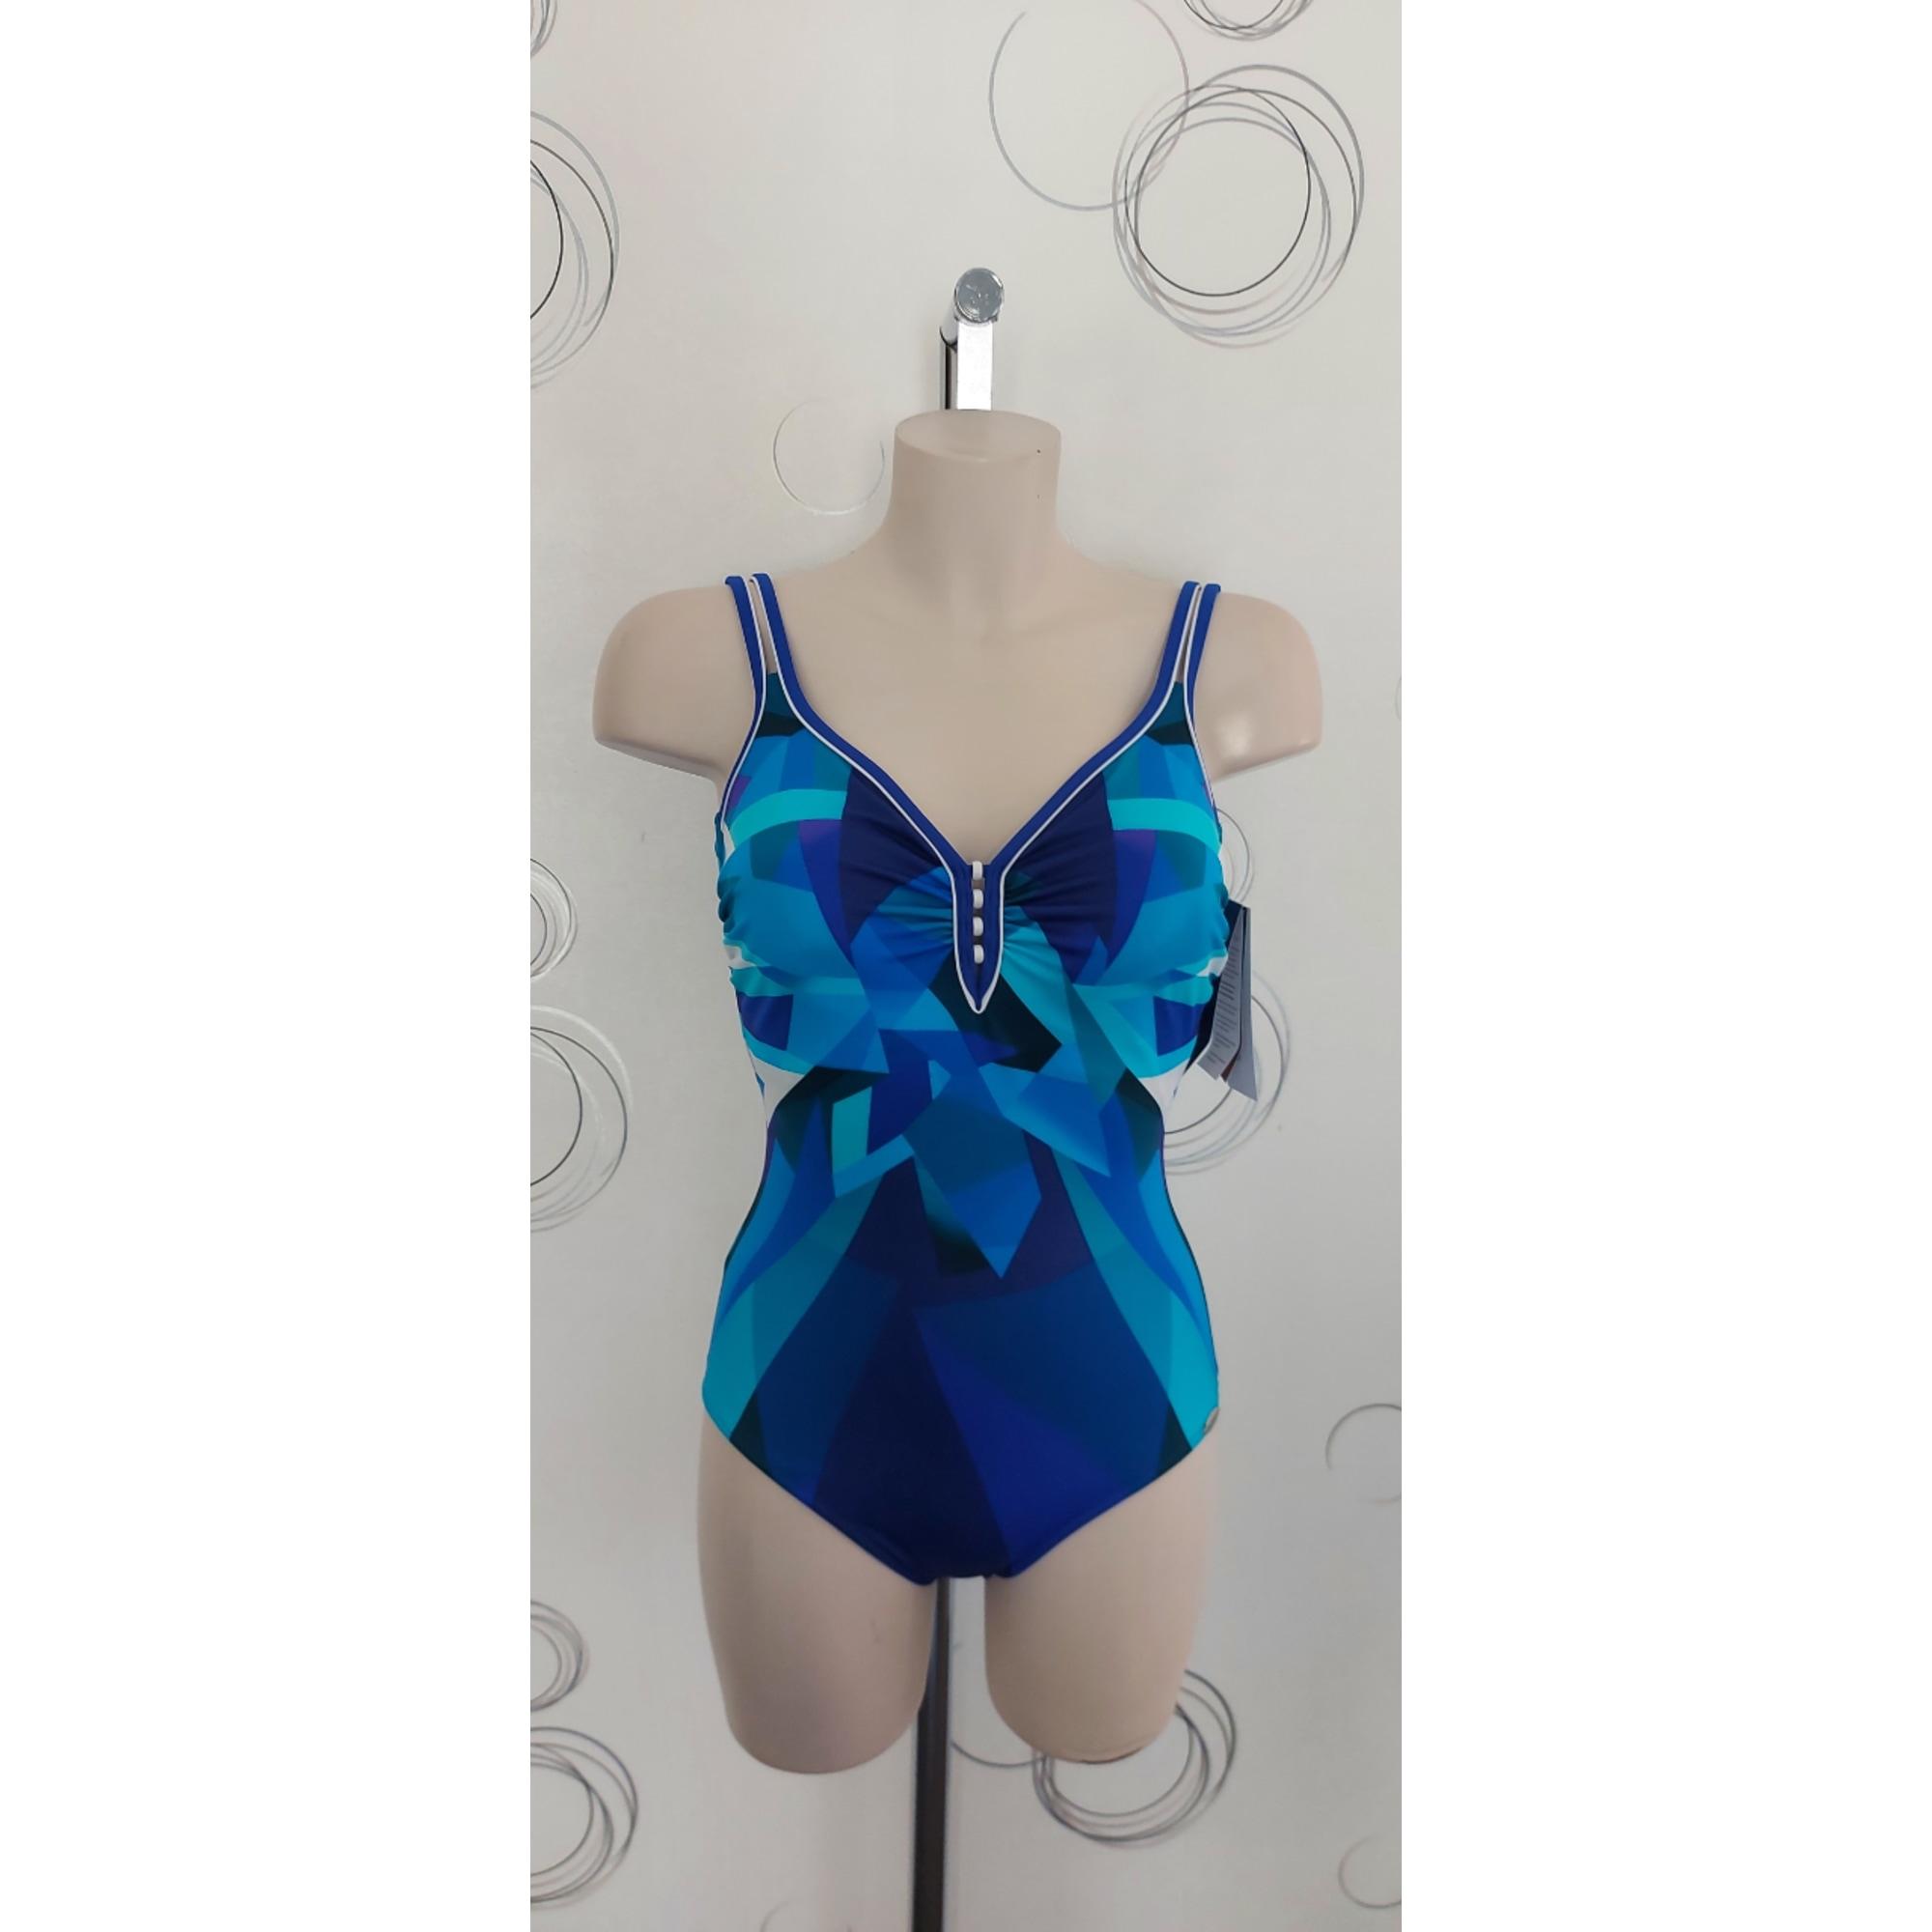 Maillot de bain une-pièce PETER HAHN Bleu, bleu marine, bleu turquoise